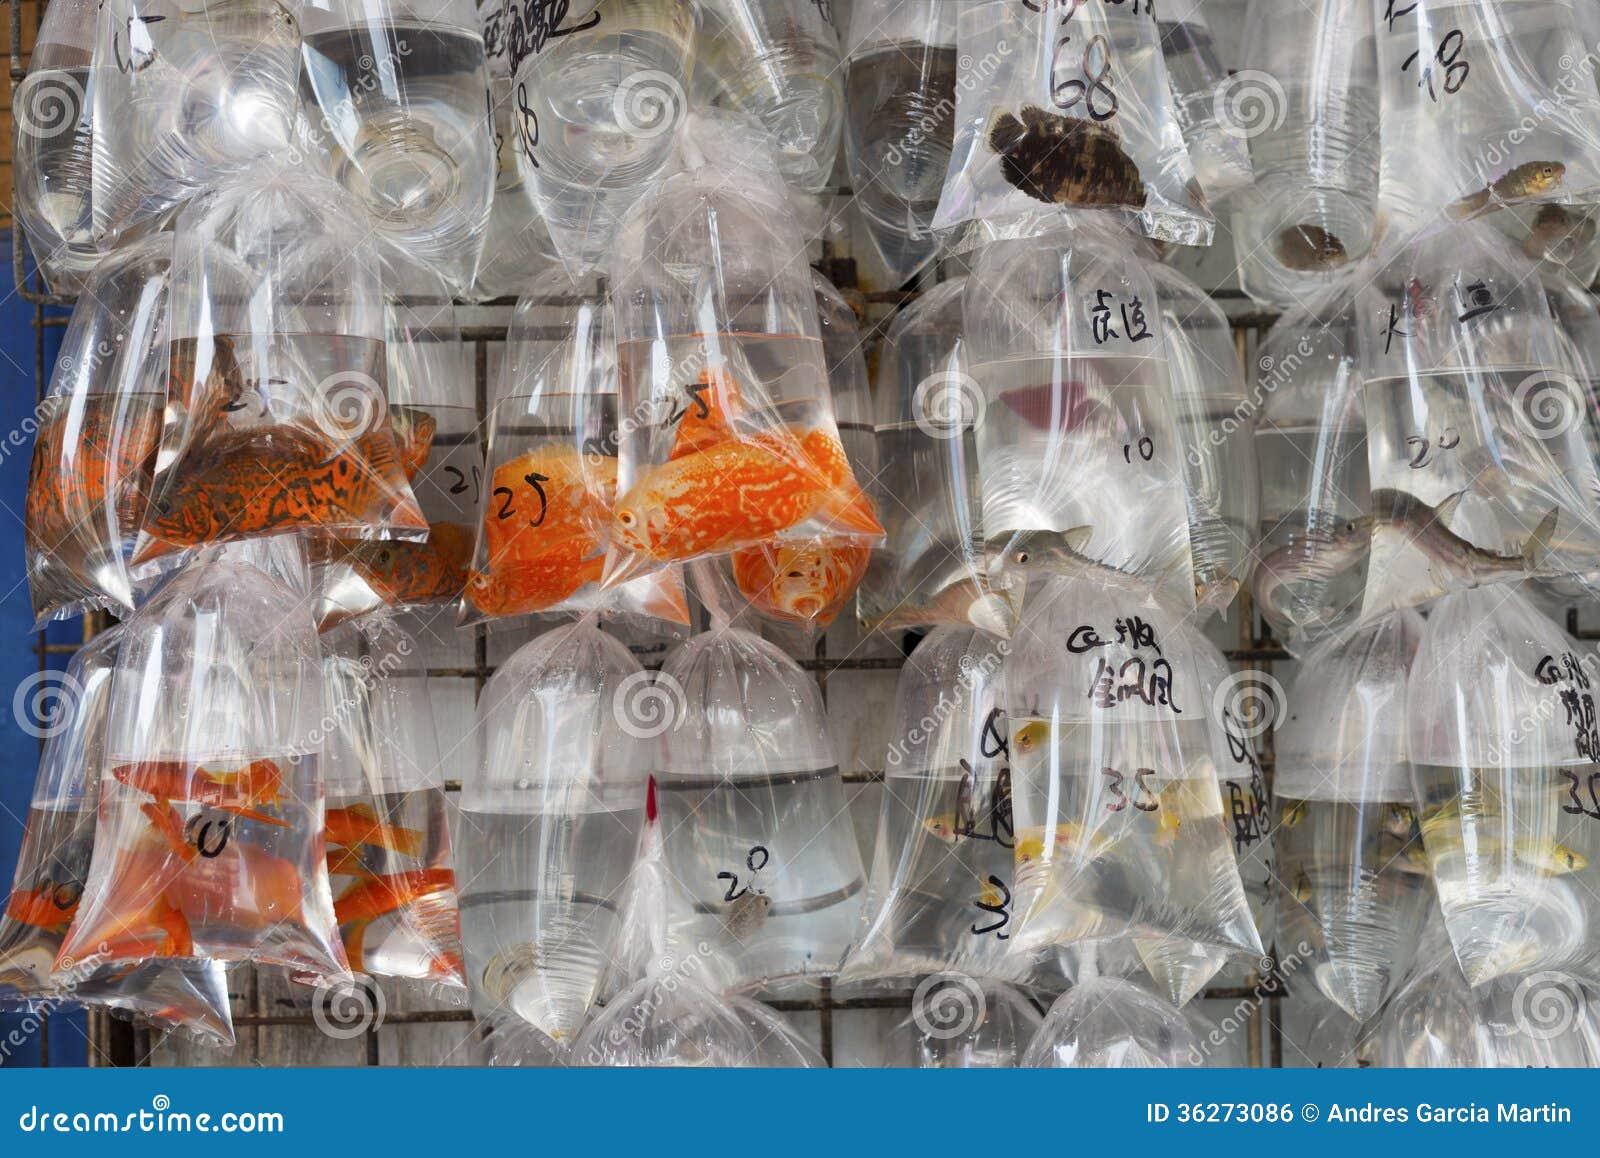 Mercato del pesce hong kong